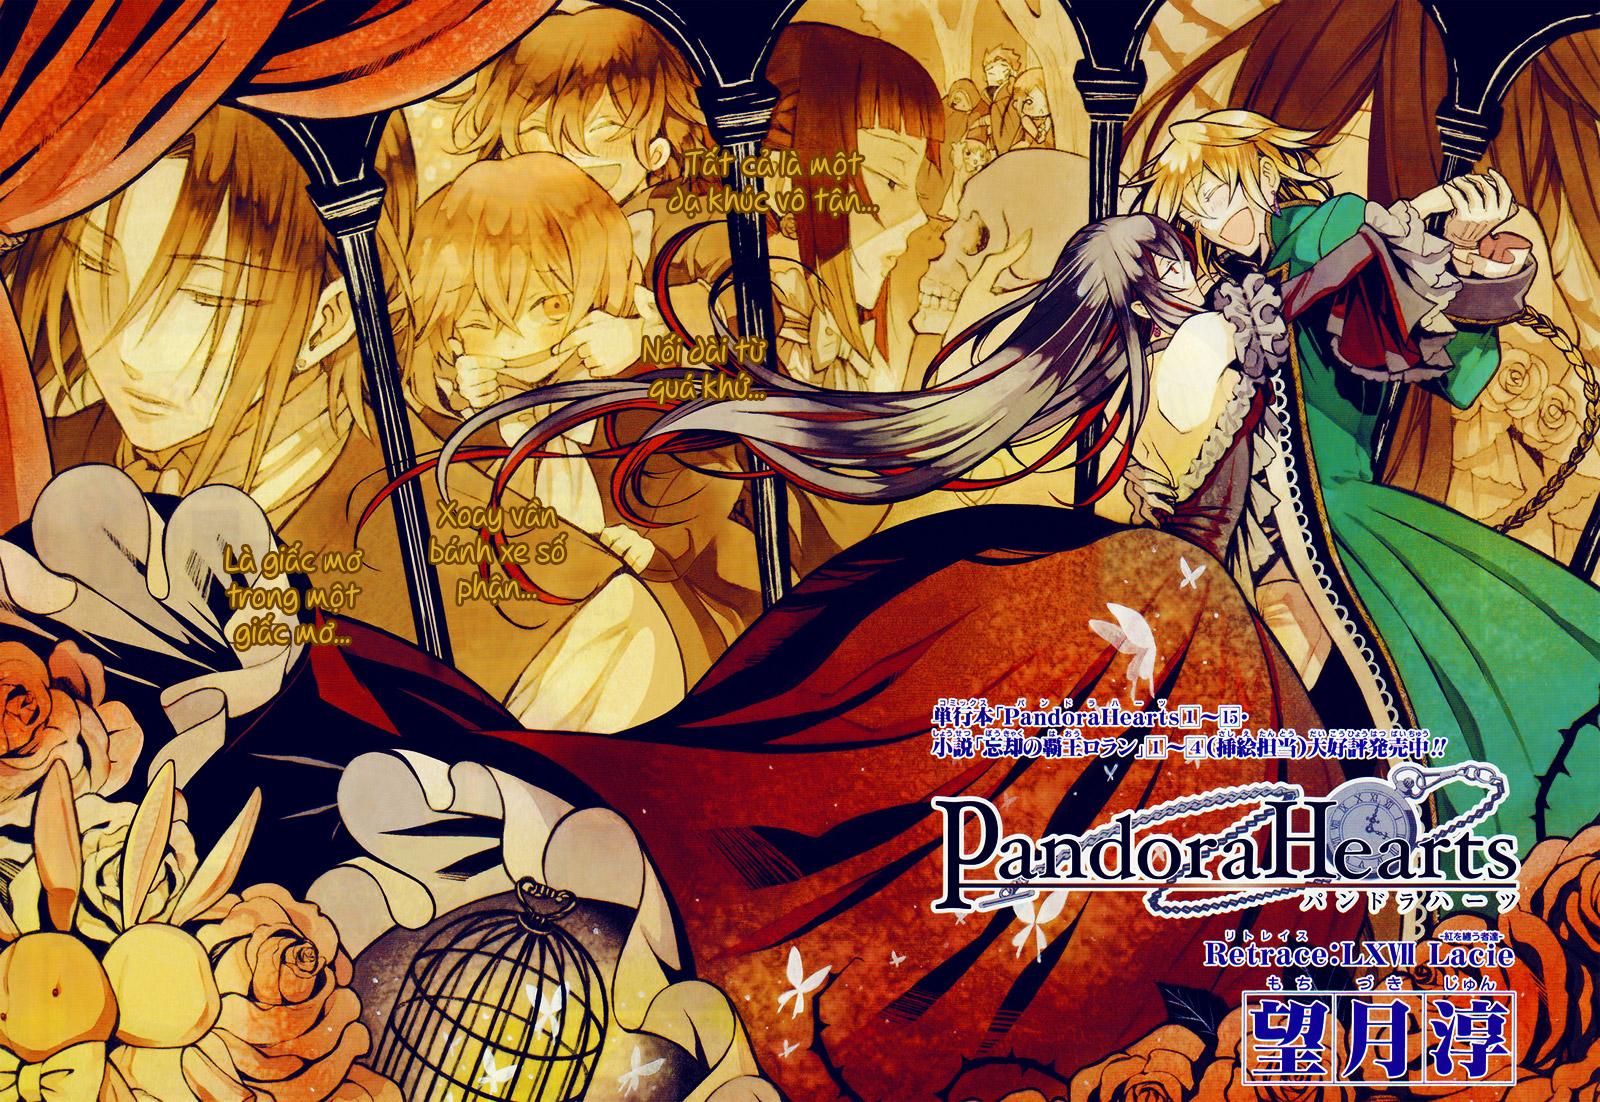 Pandora Hearts chương 067 - retrace: lxvii lacie trang 2